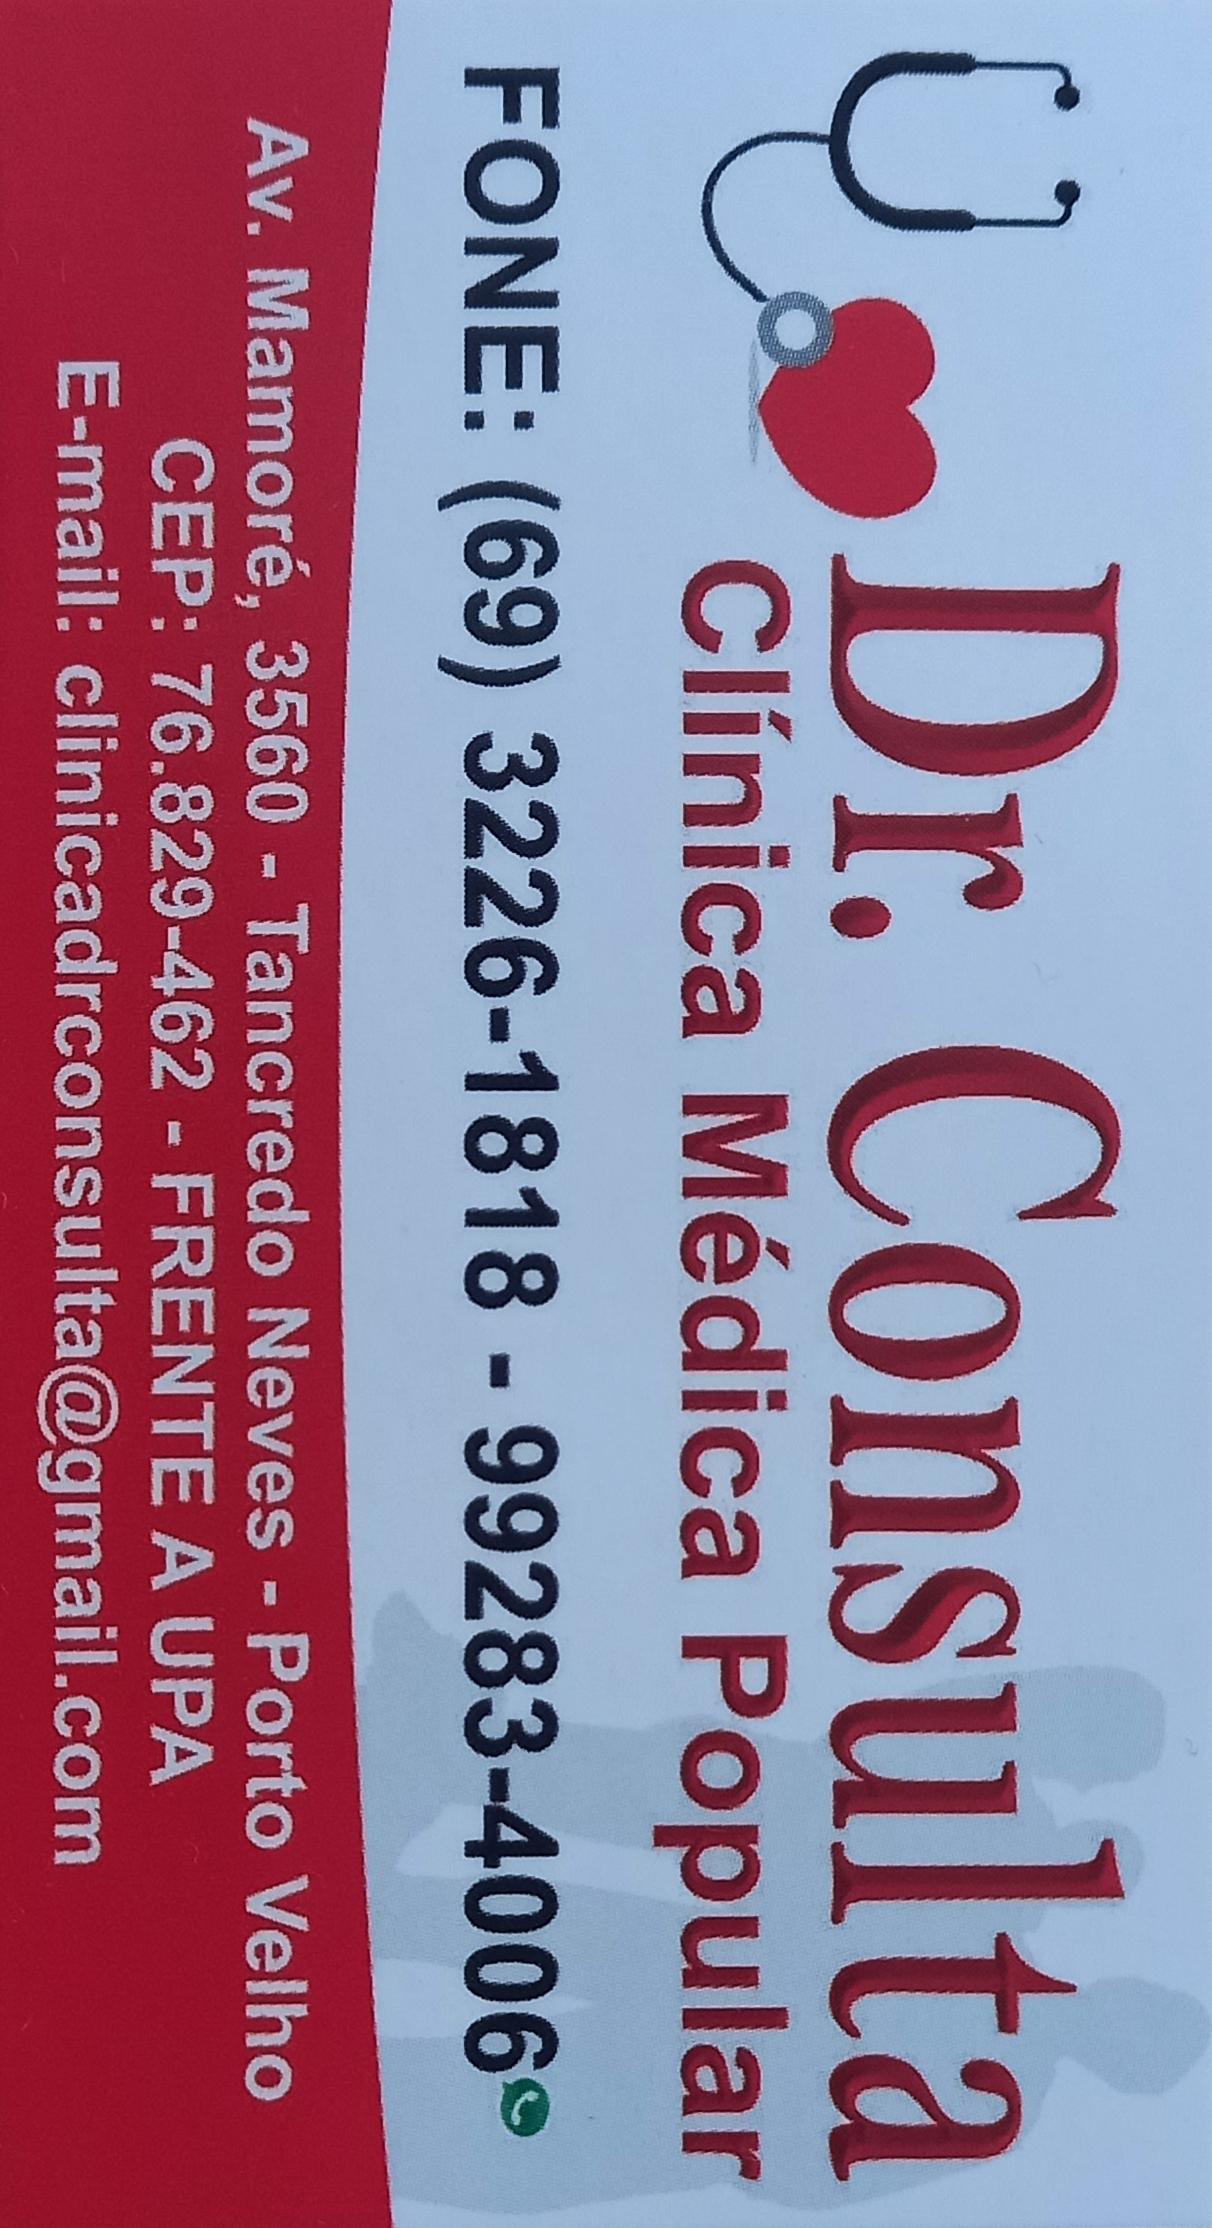 Clínica Popular na Zona Leste em Porto Velho. Dr. CONSULTA